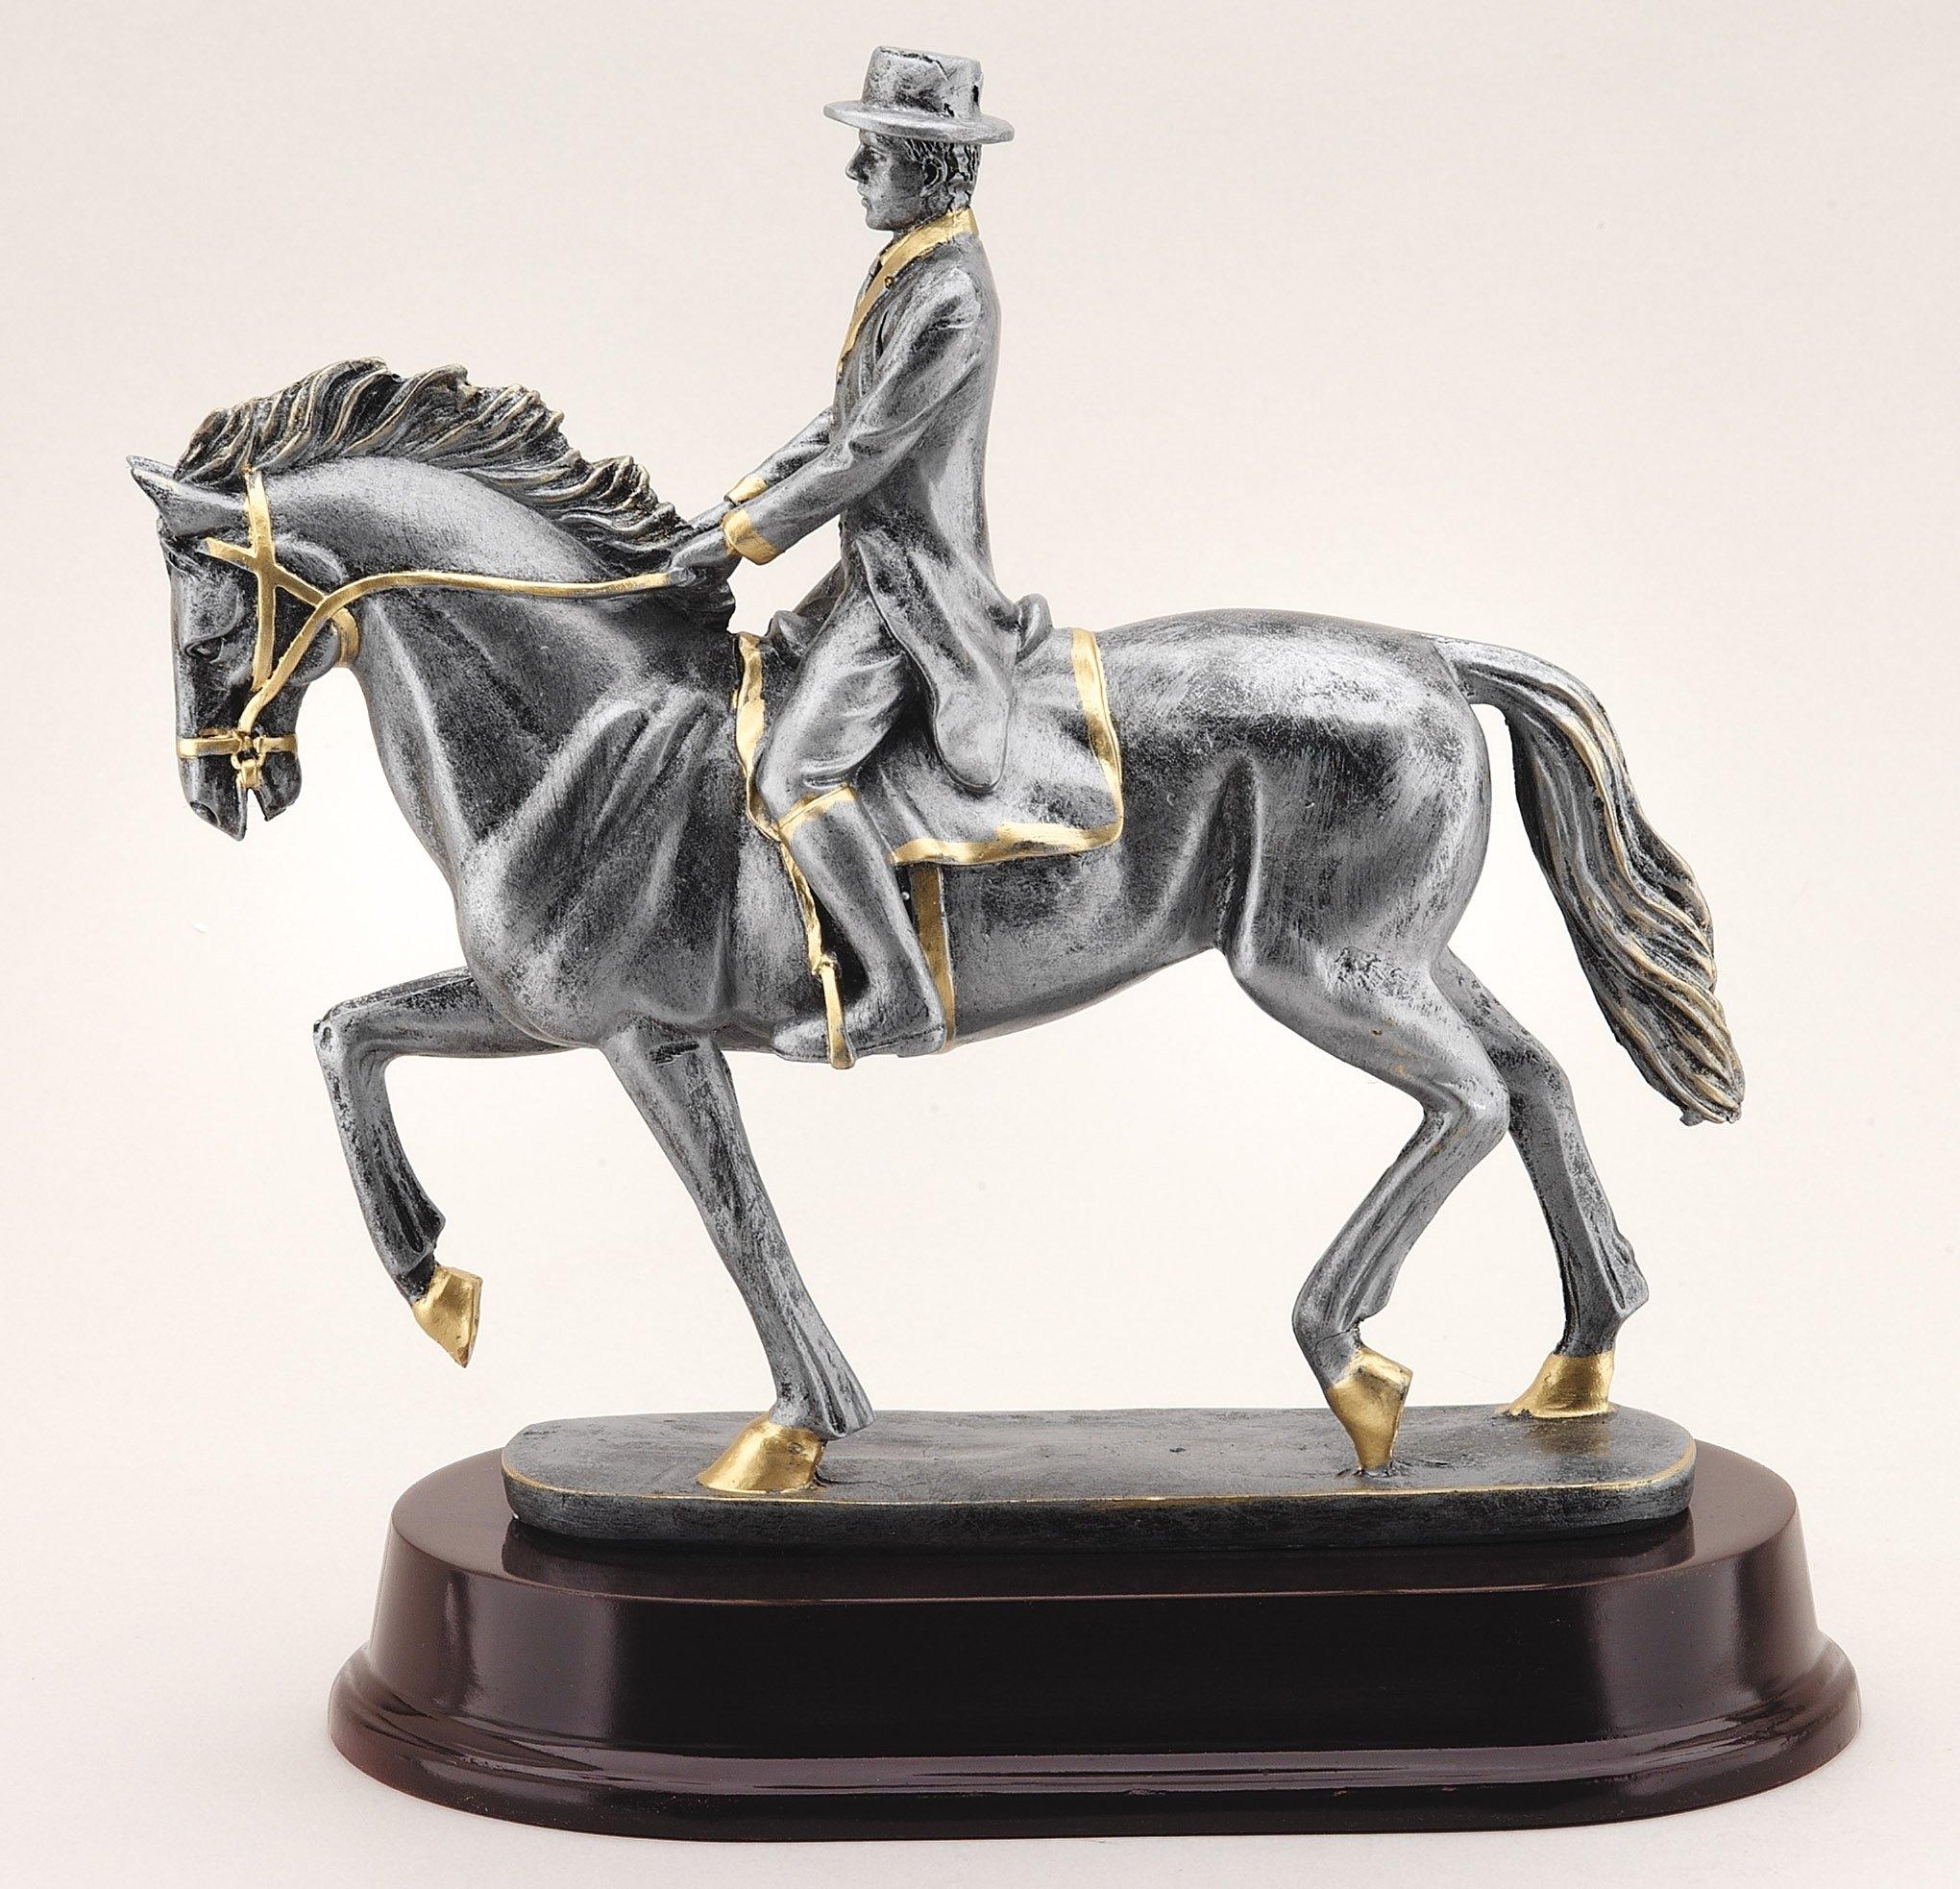 Equestrian Trophies Resin Horse /& Jockey Trophy Award 3 Sizes FREE Engraving